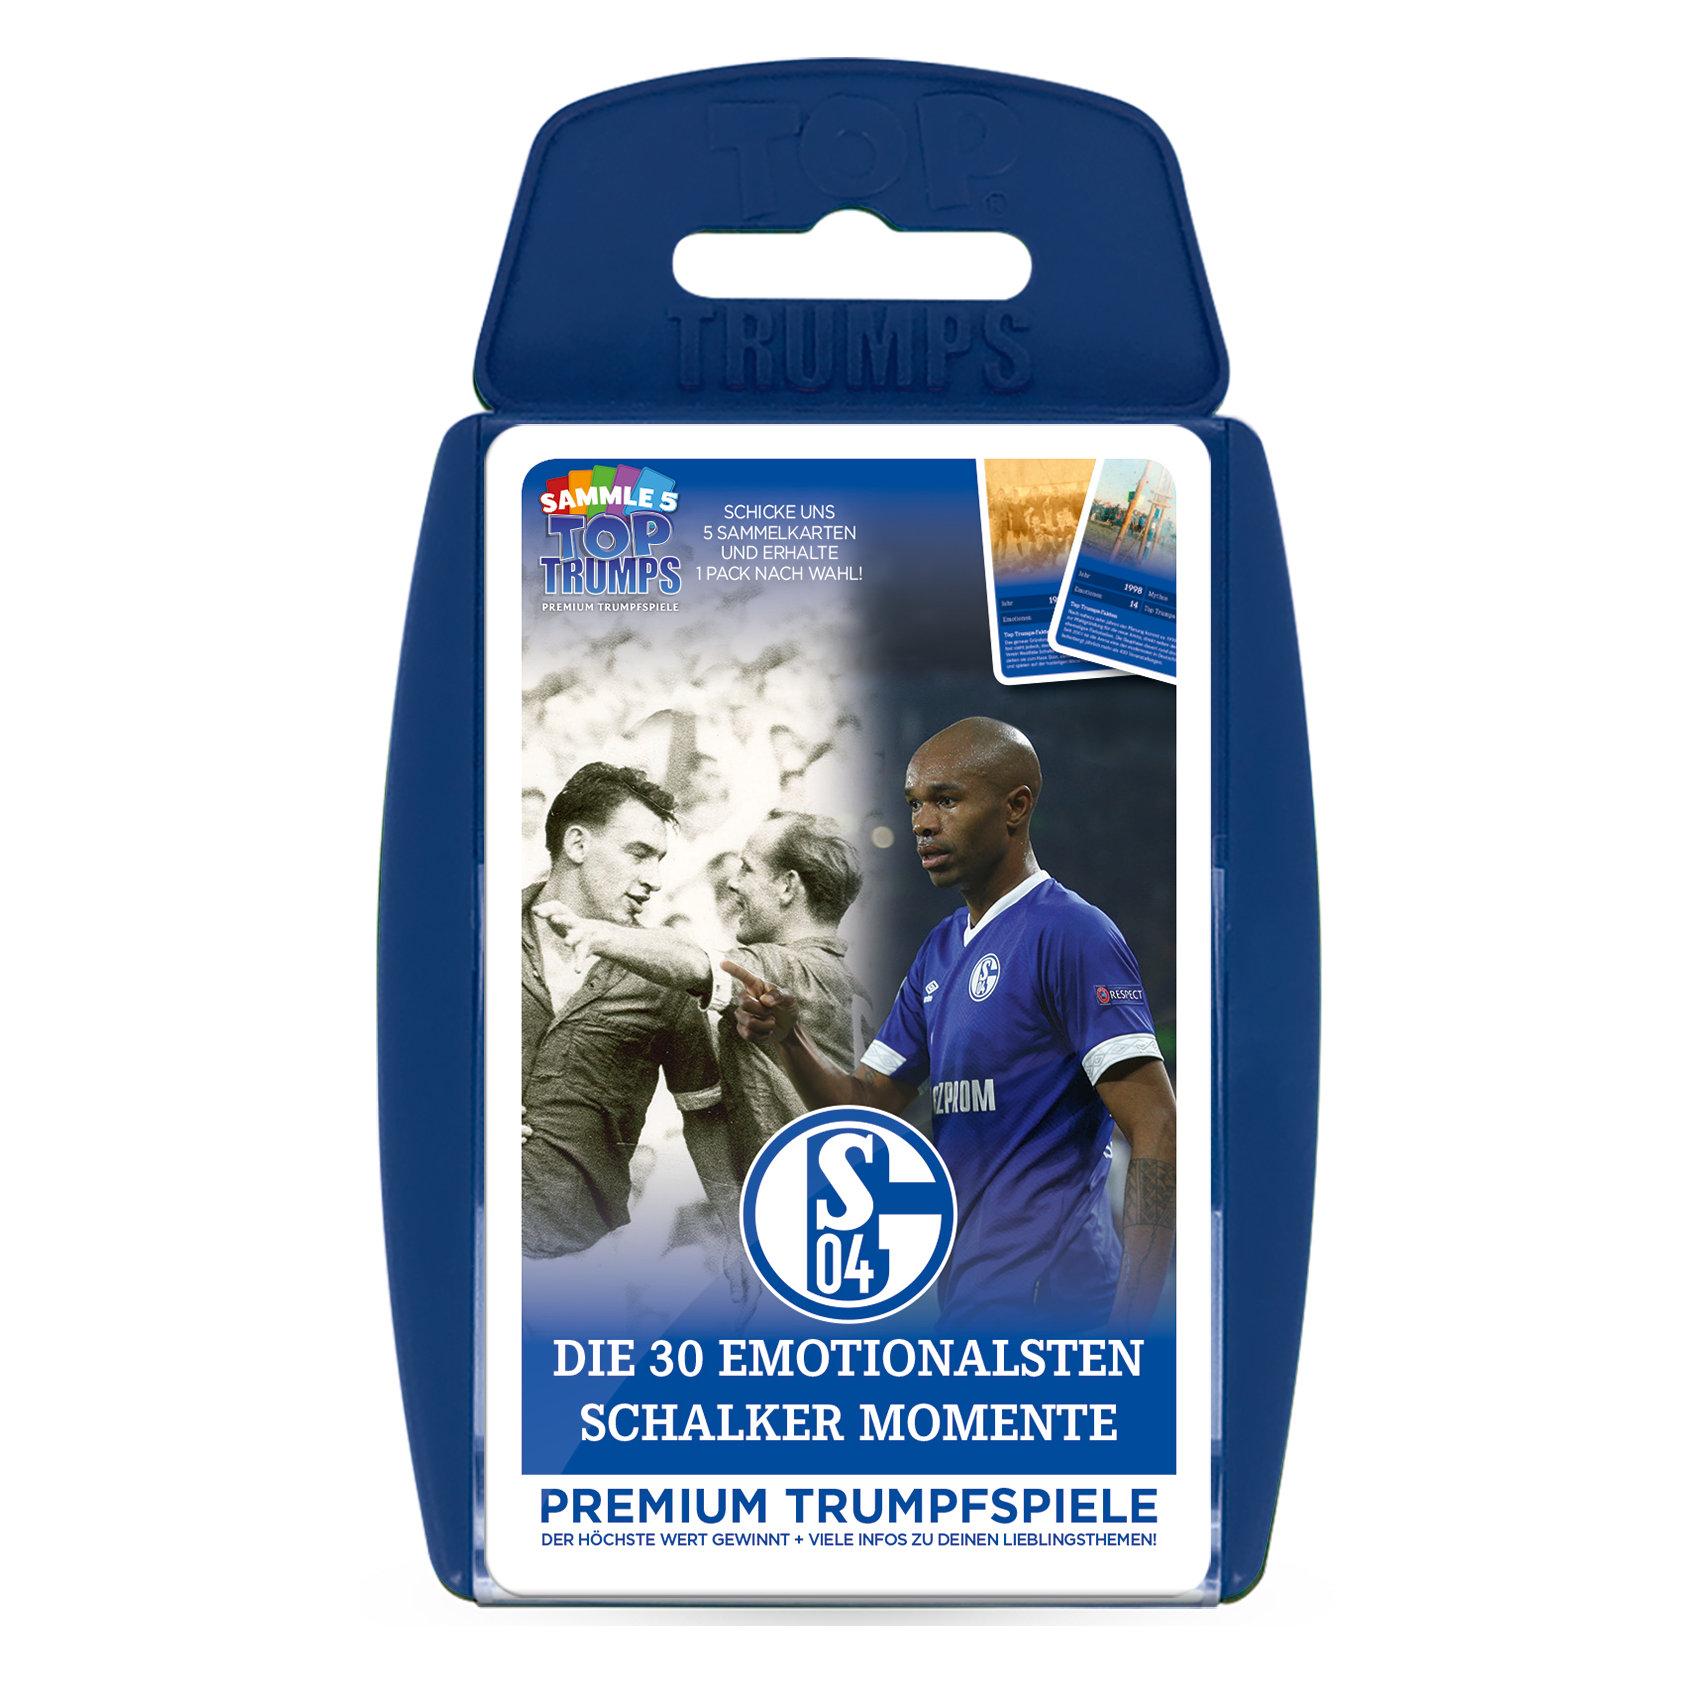 Top Trumps FC Schalke 04 Die emotionalsten Schalker Momente